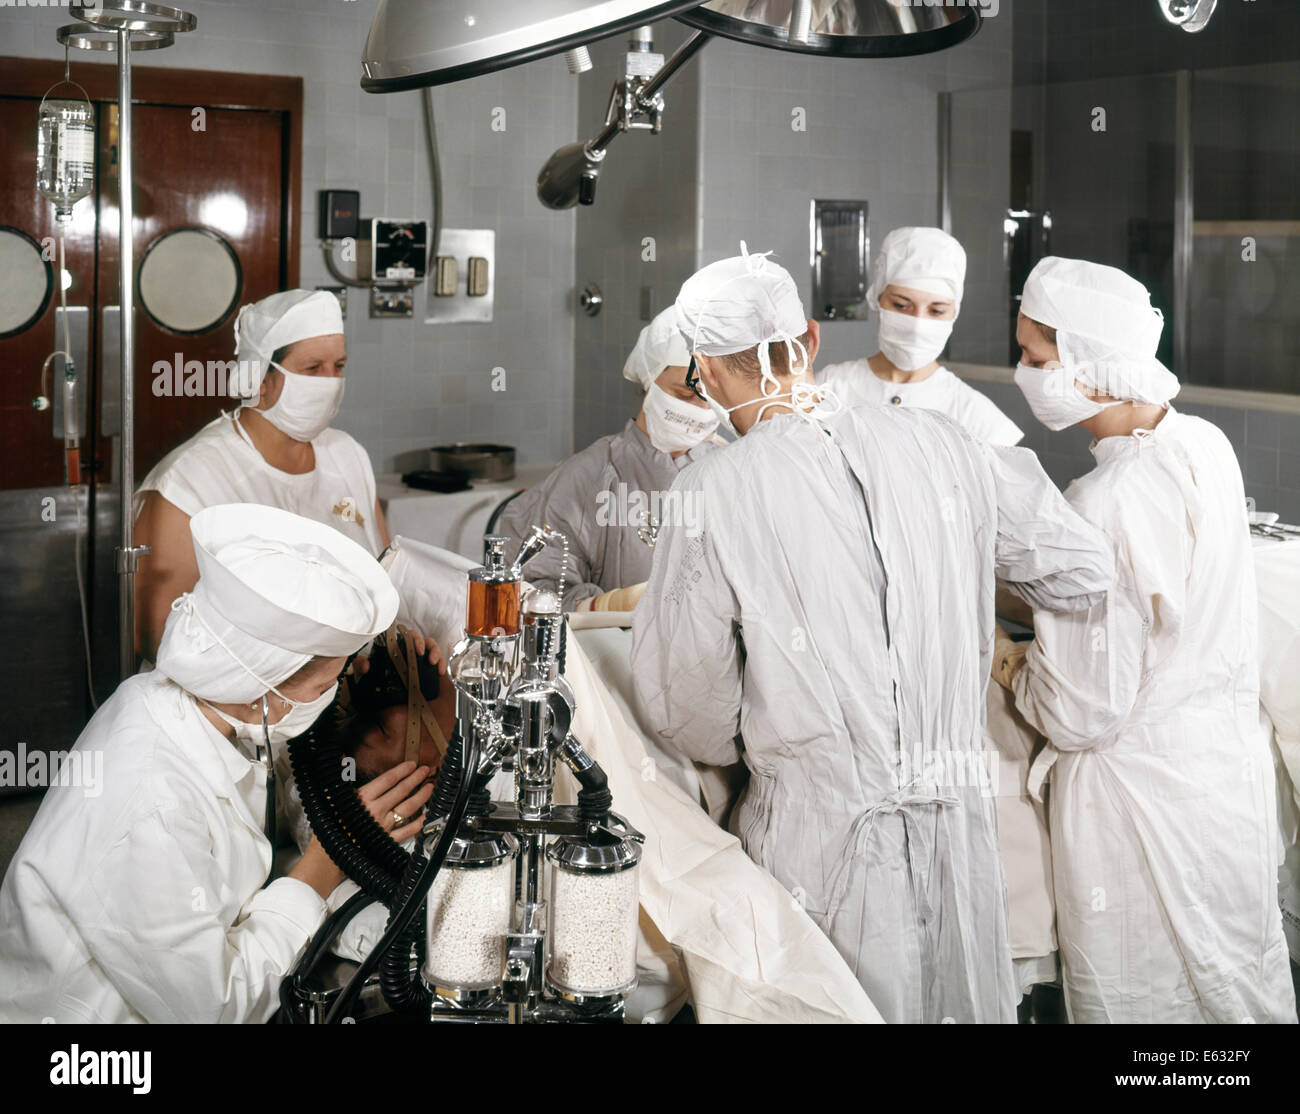 how to become a circulating nurse